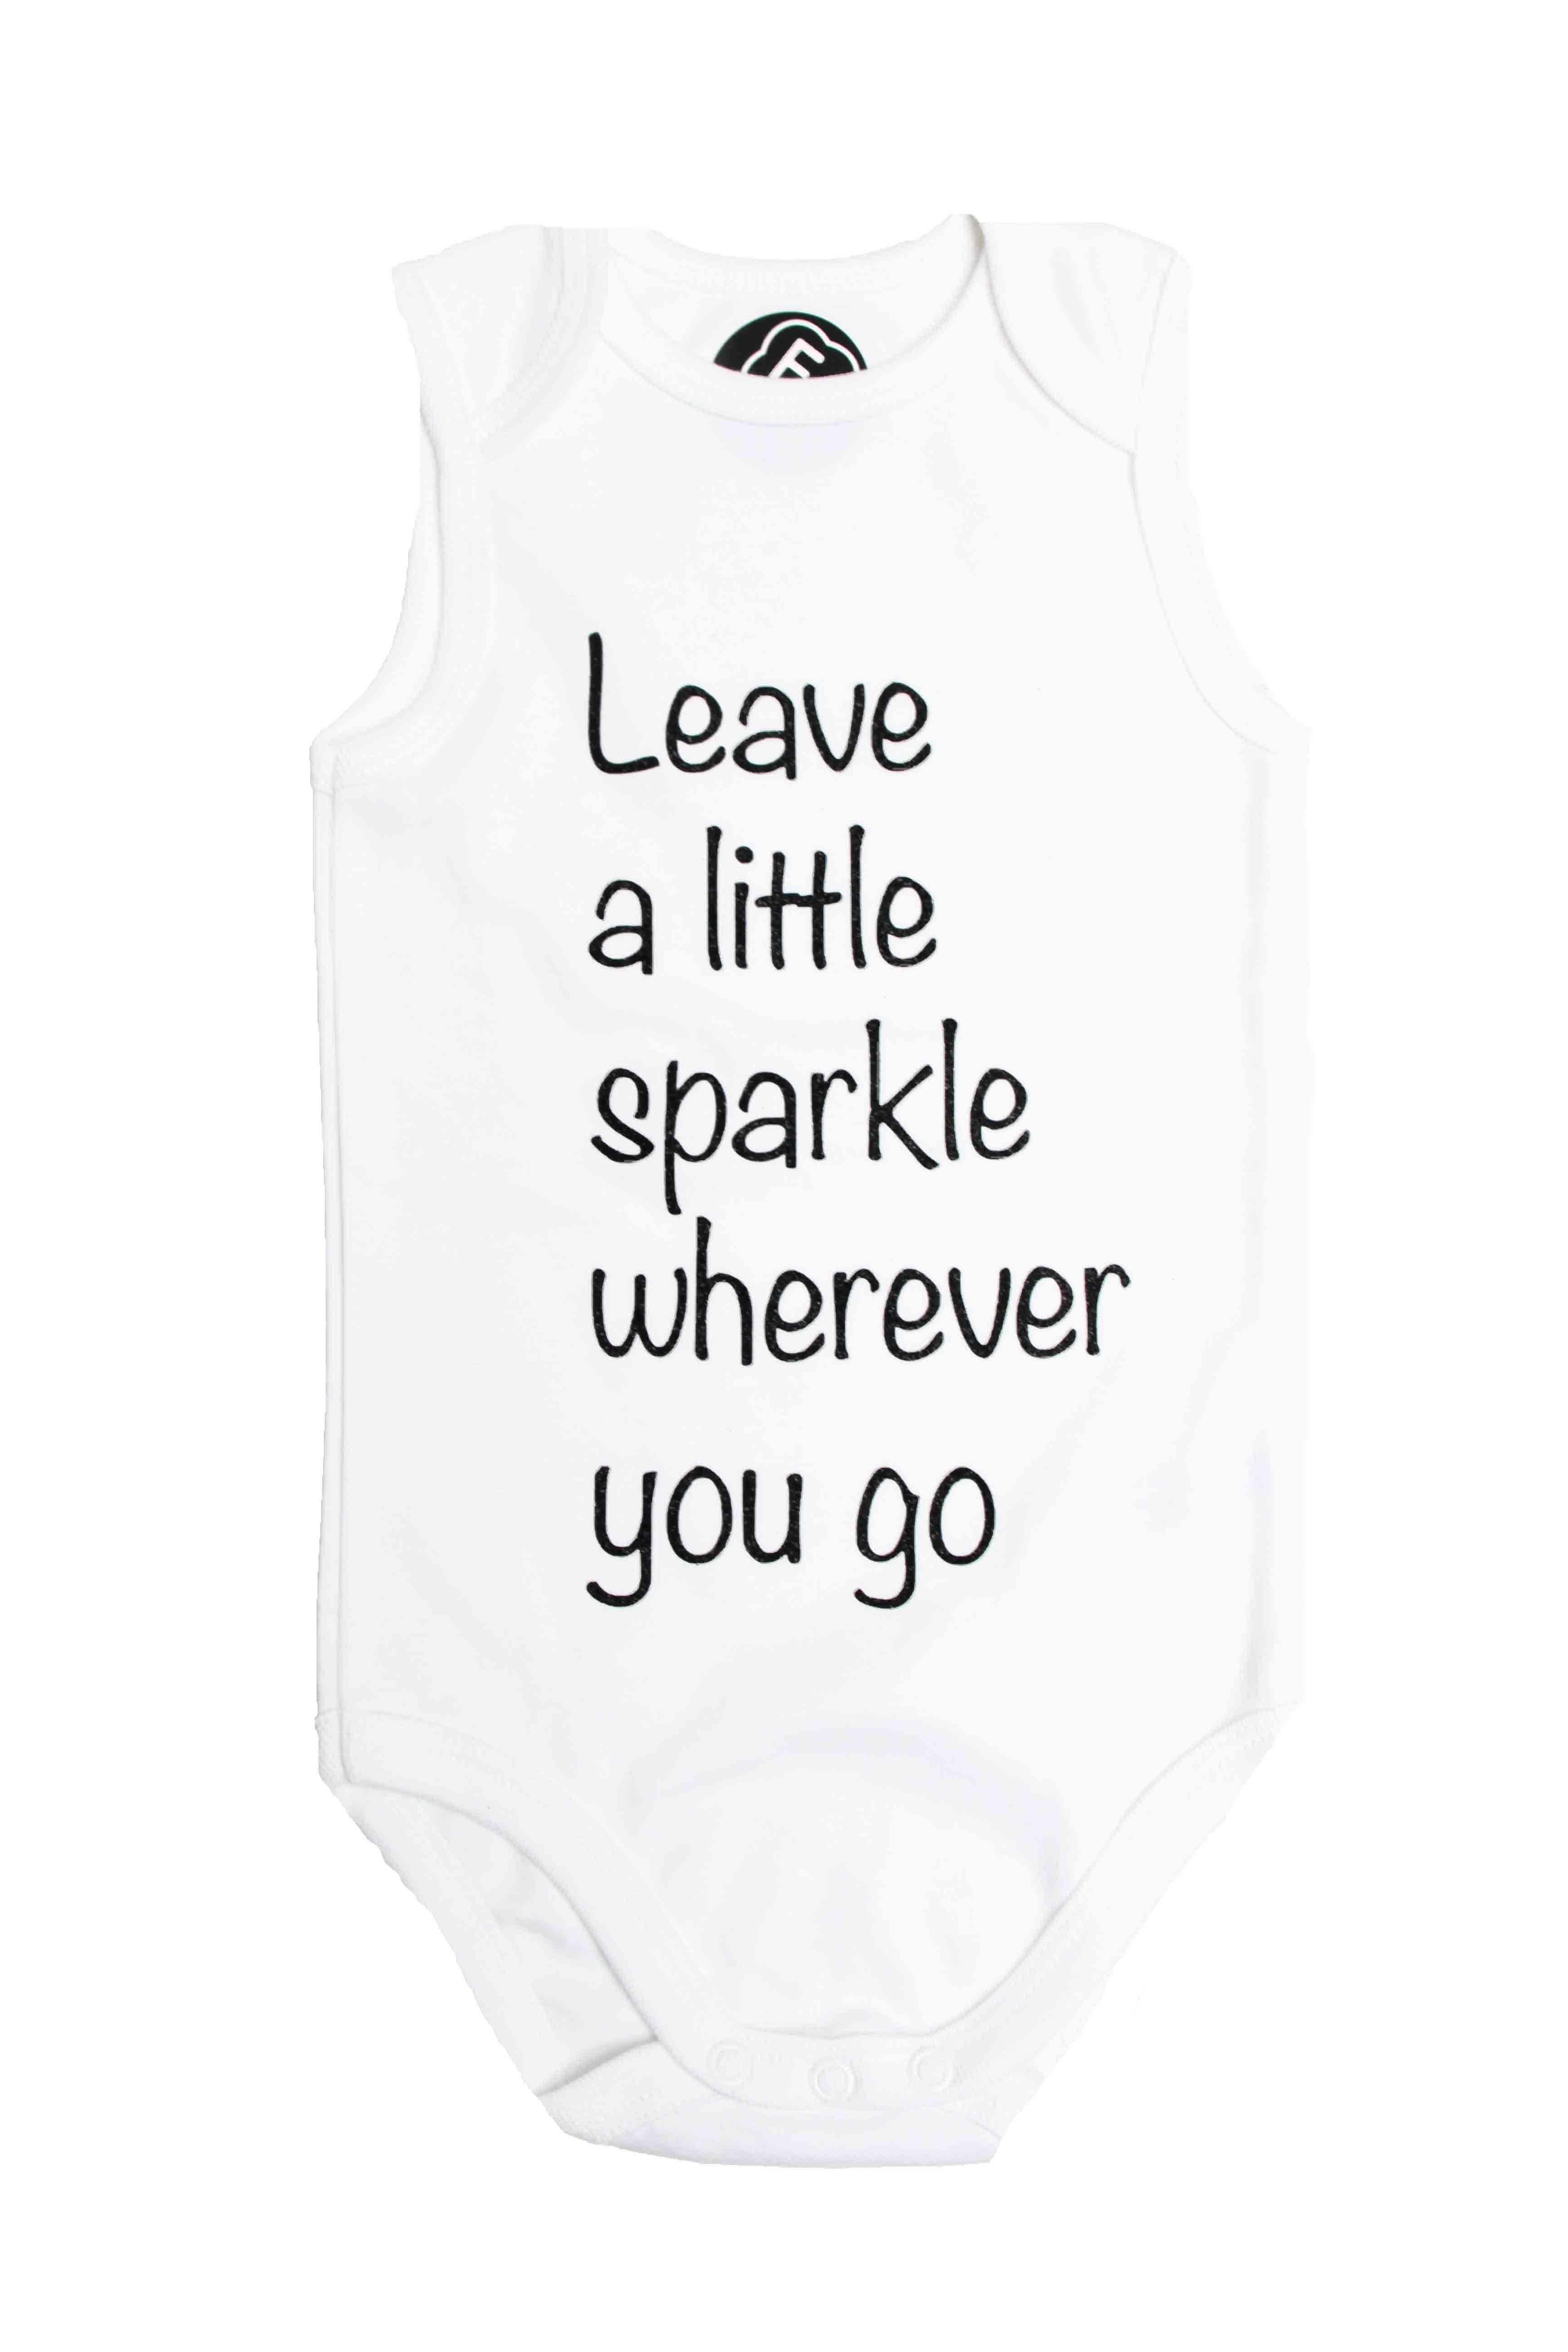 Newarrival: babybody sparkle l romper   #fabsworld #fabs #sparkle #quote #babybody #romper #babyshower #giftidea #babyidea #gift #present #kado #baby #kids #children #fashion #babyfashion #babyclothes #babygift #pregnancy #zwanger  shop:www.fabsstore.com (ship worldwide)